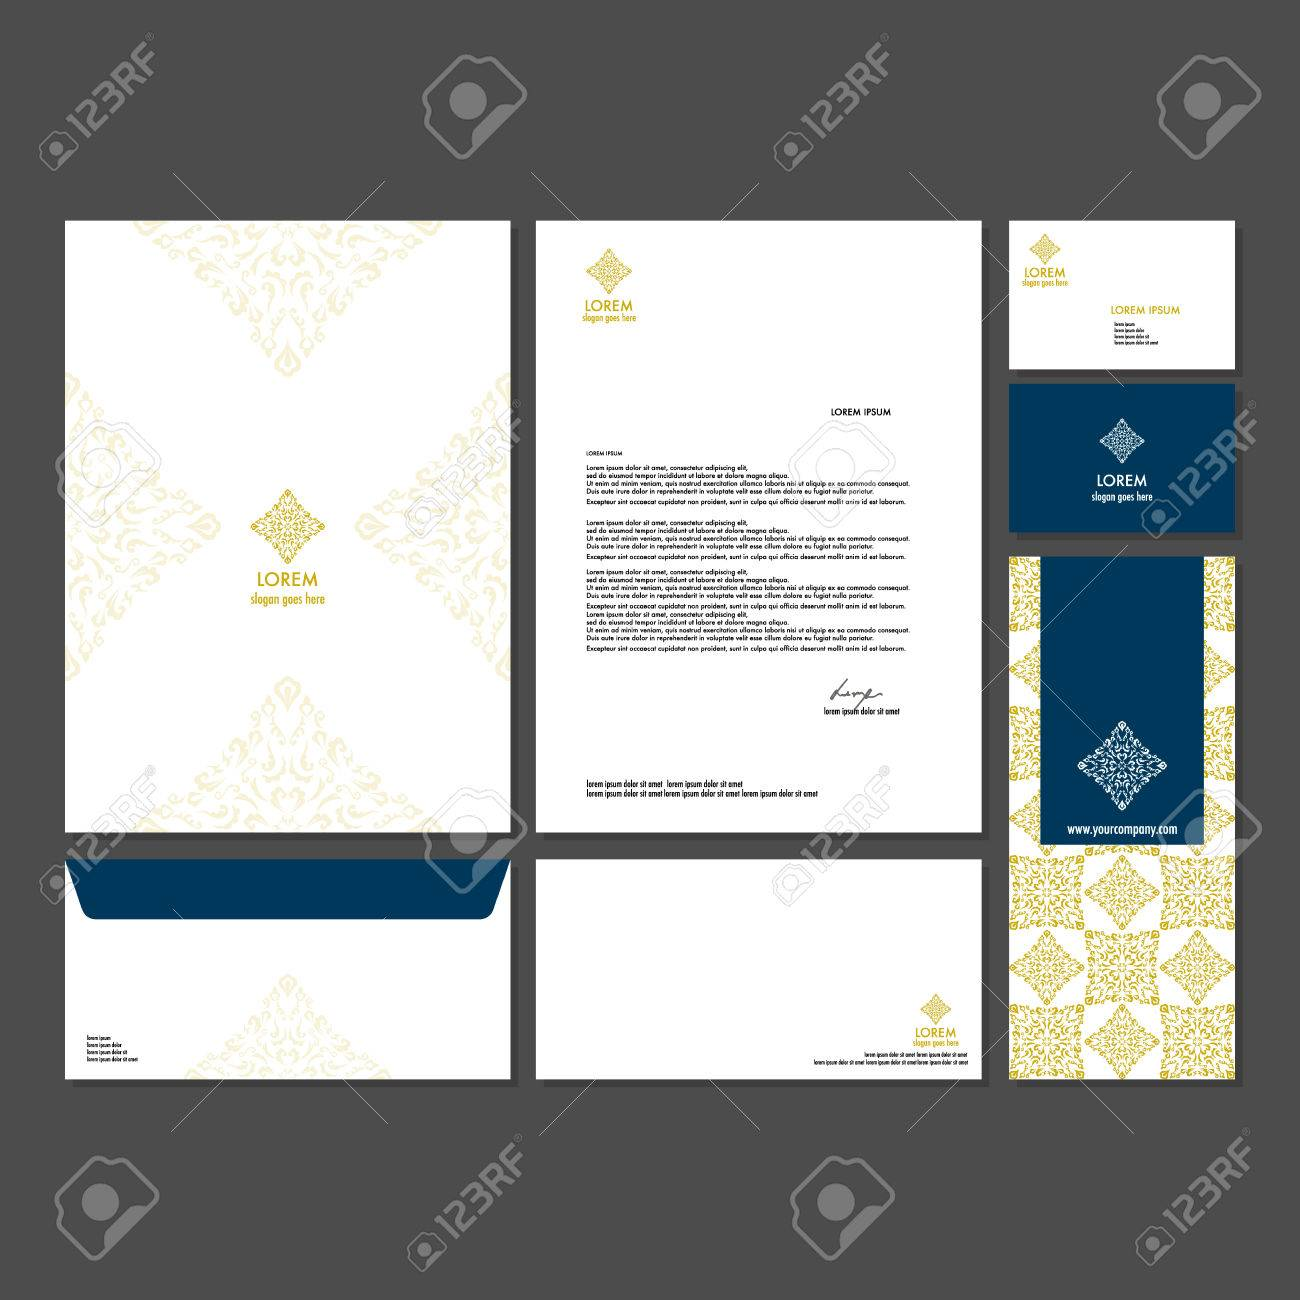 Branding Identity Template Corporate Company Design. Set - Business ...